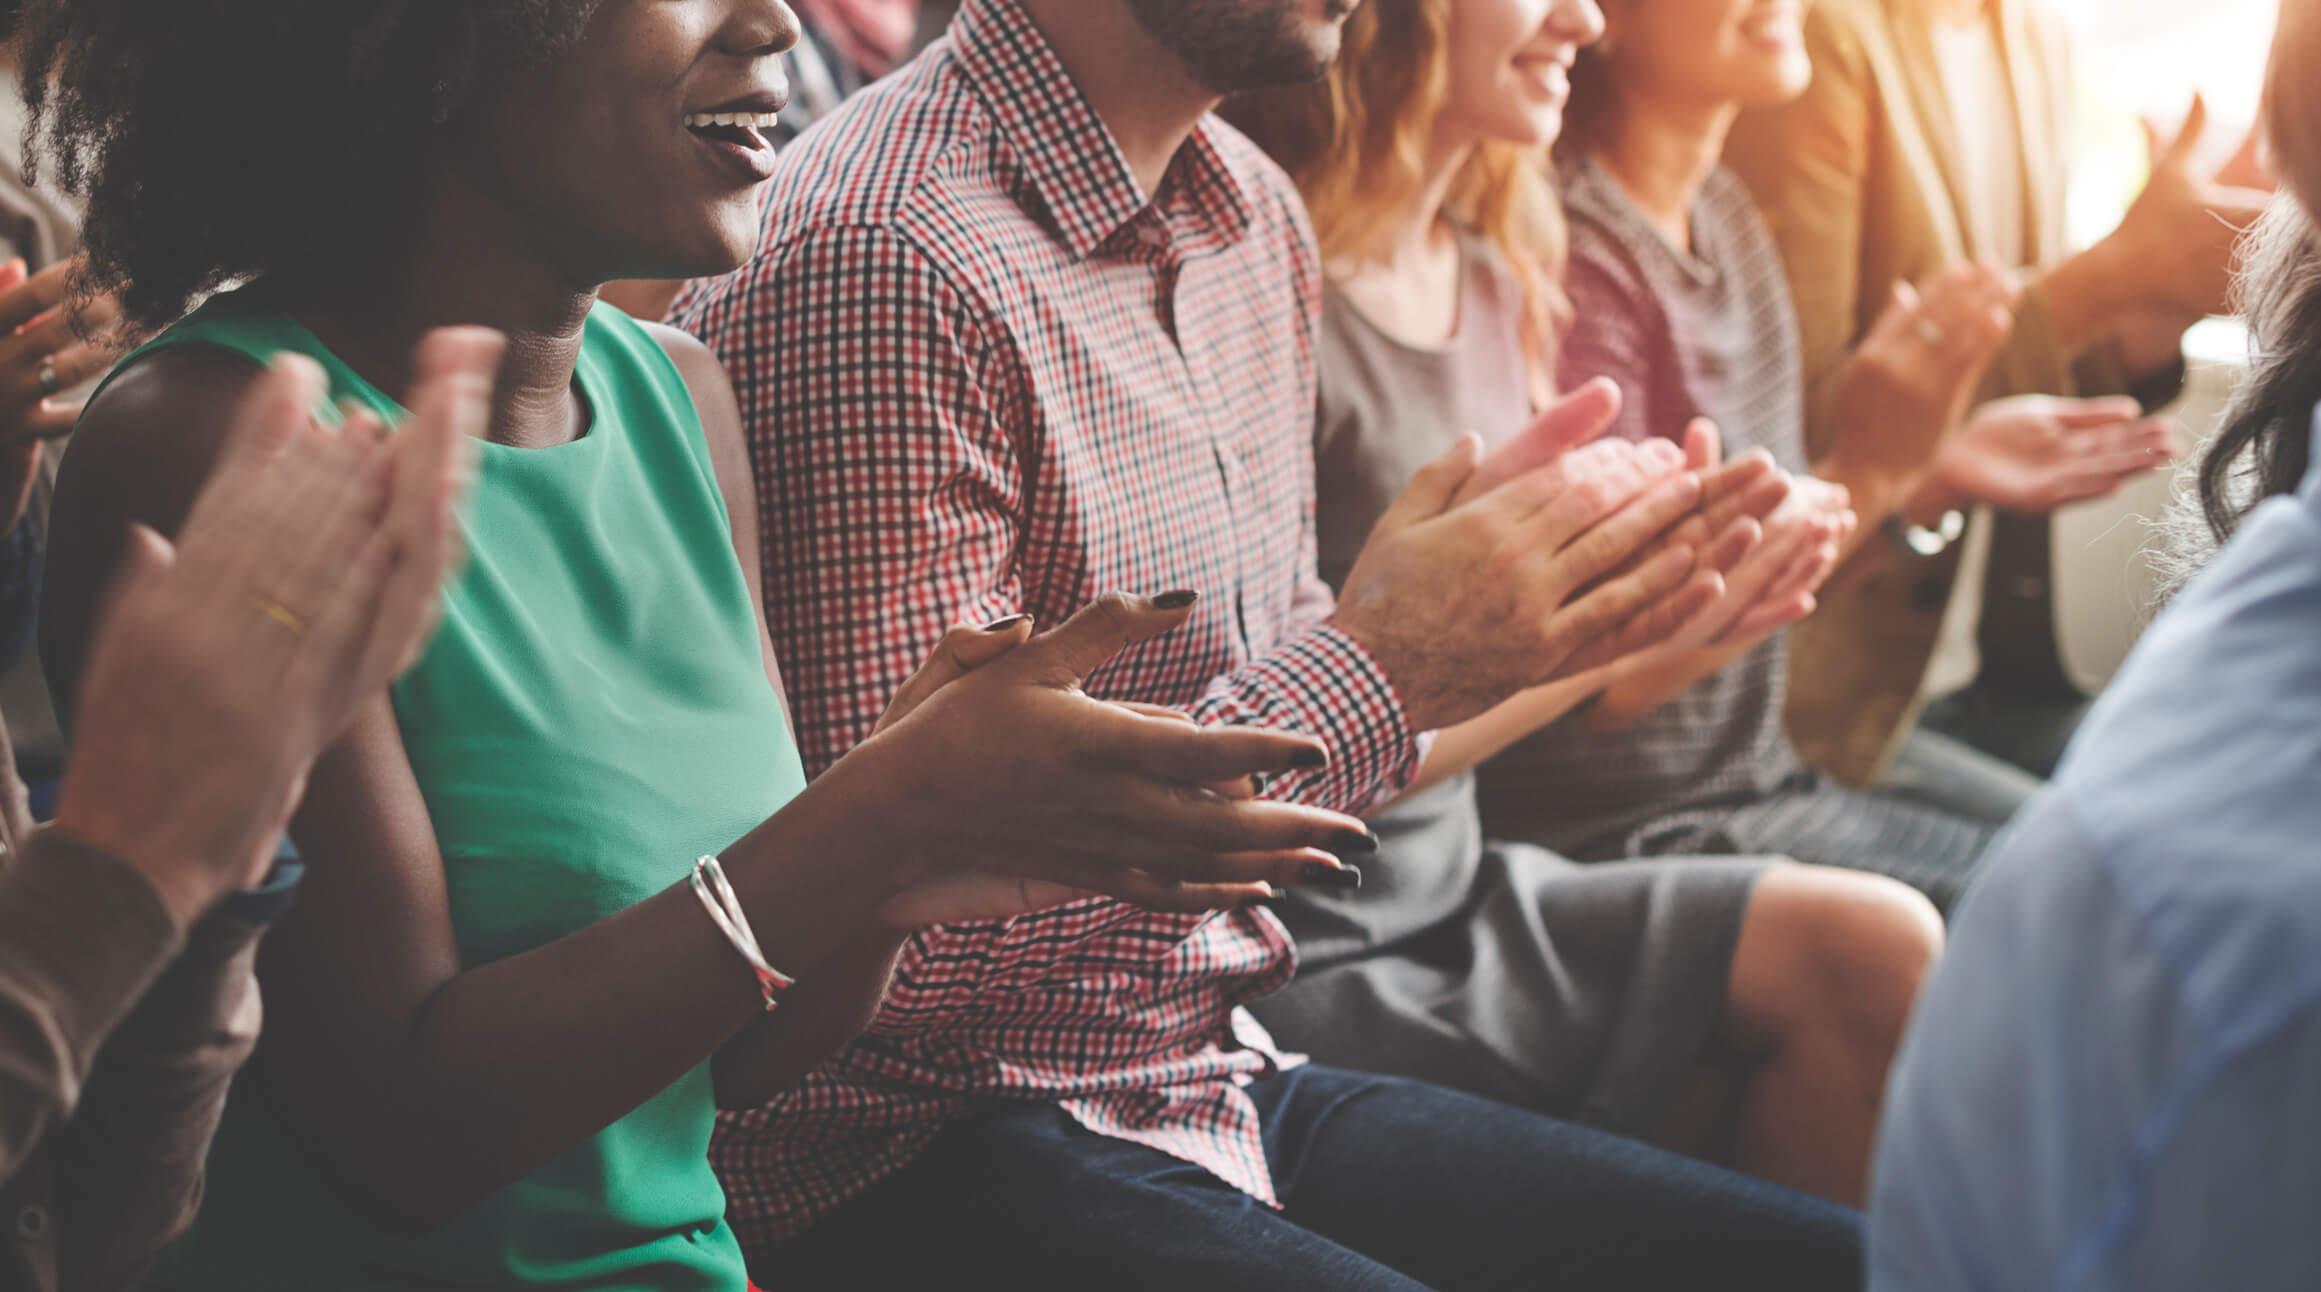 Persuasive CommunicationInspired LeadershipWinning Sales Presentations - We help you achieve all three.